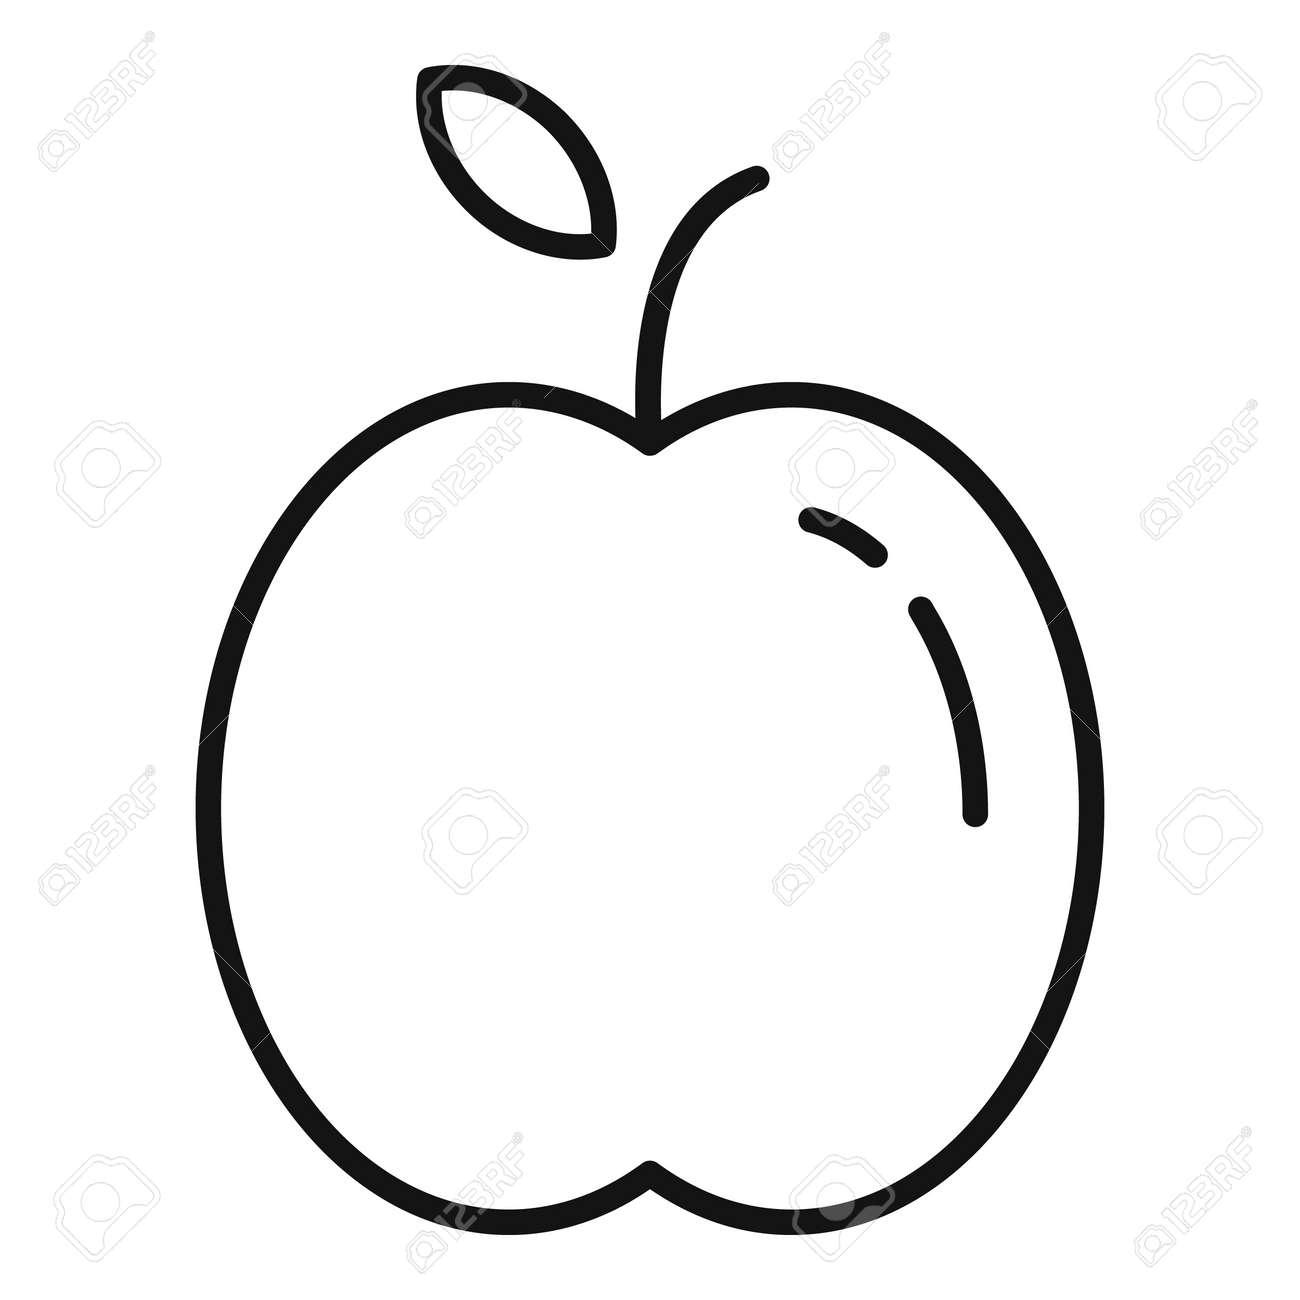 Farm apple icon, outline style - 169751545